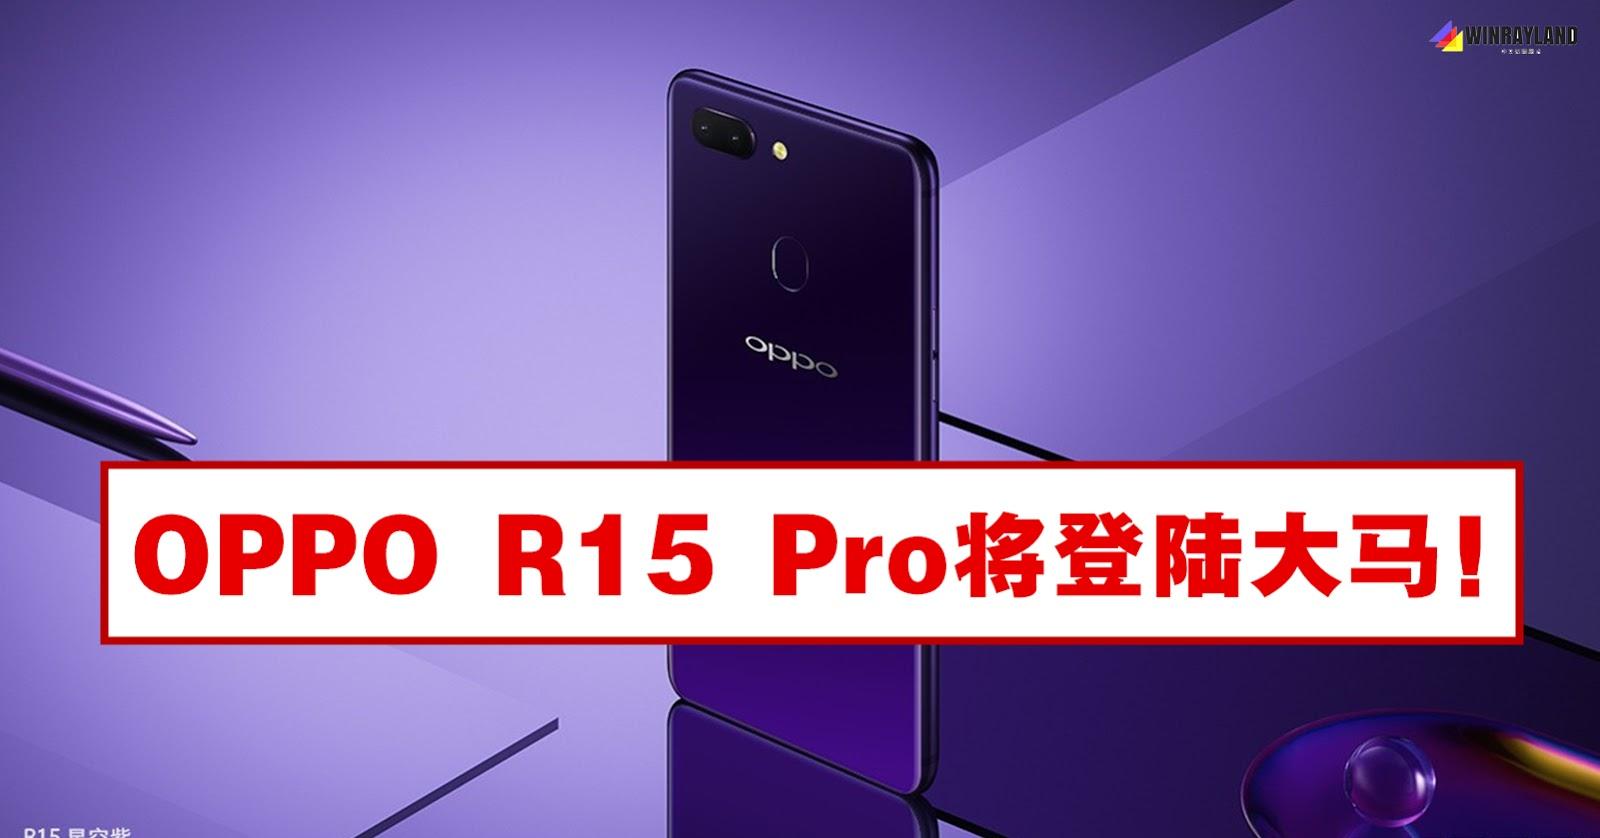 OPPO R15 Pro將登陸大馬! - WINRAYLAND